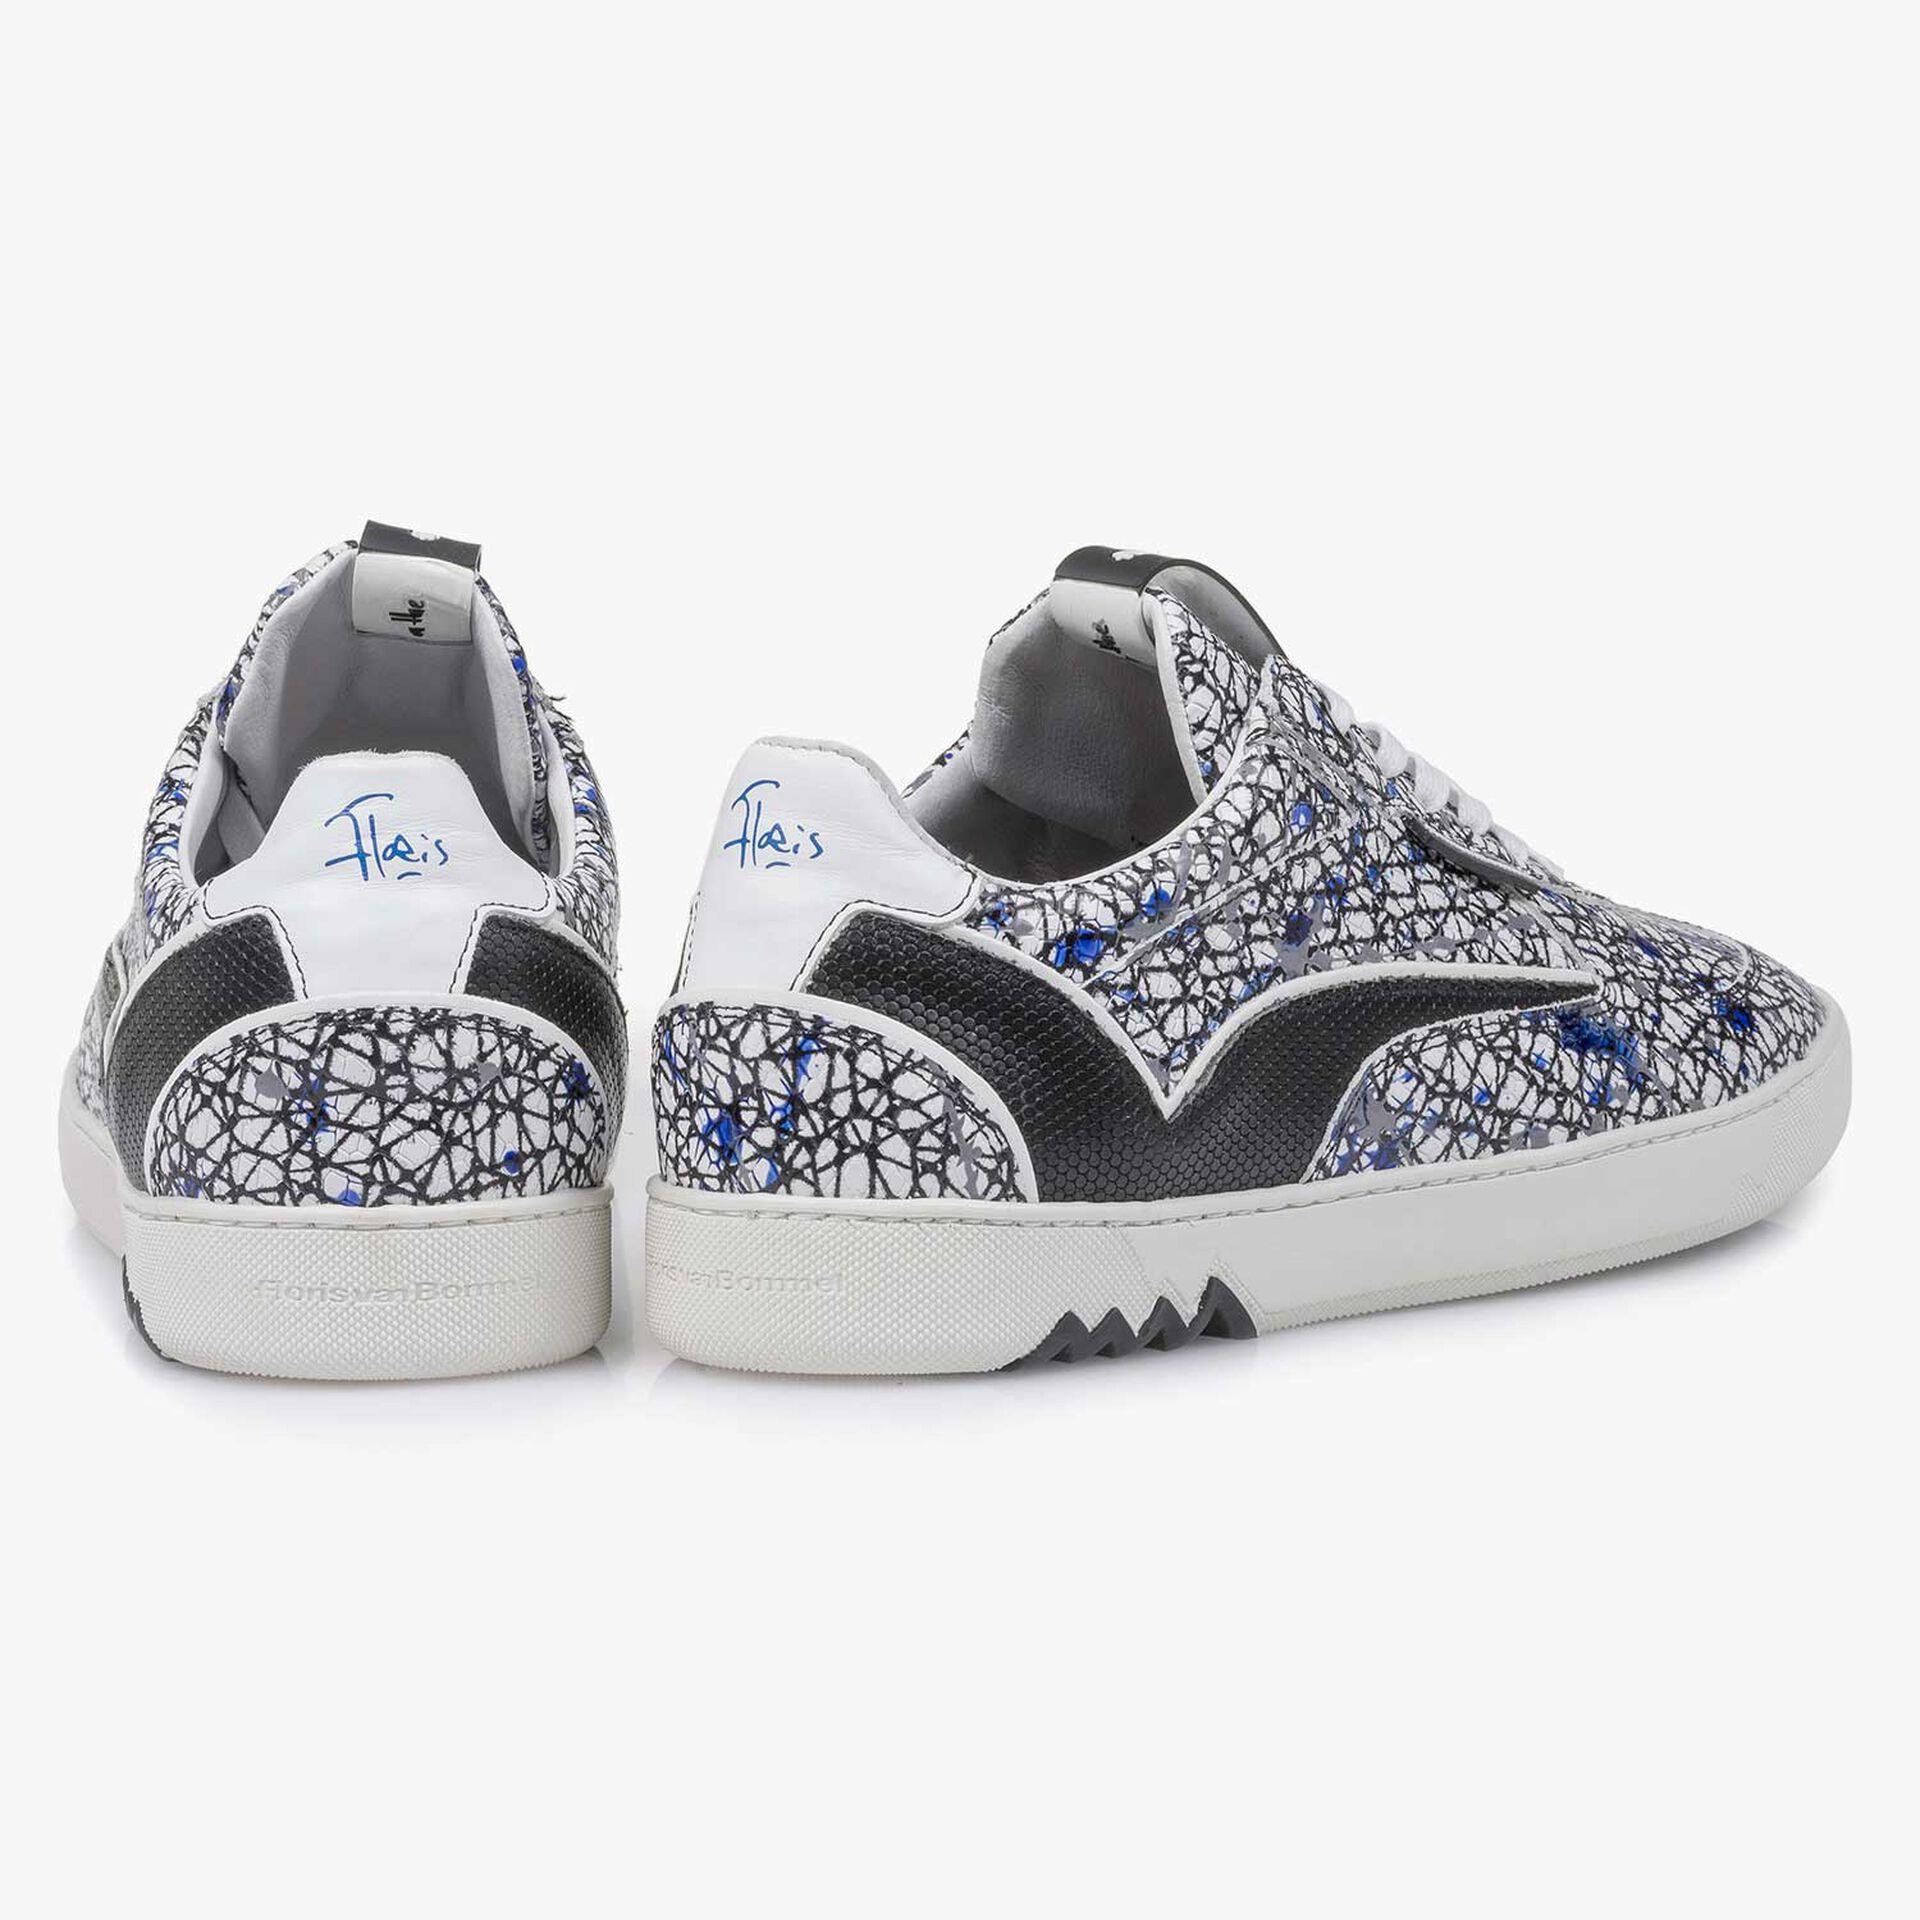 Weißer Kalbsleder-Sneaker mit Muster